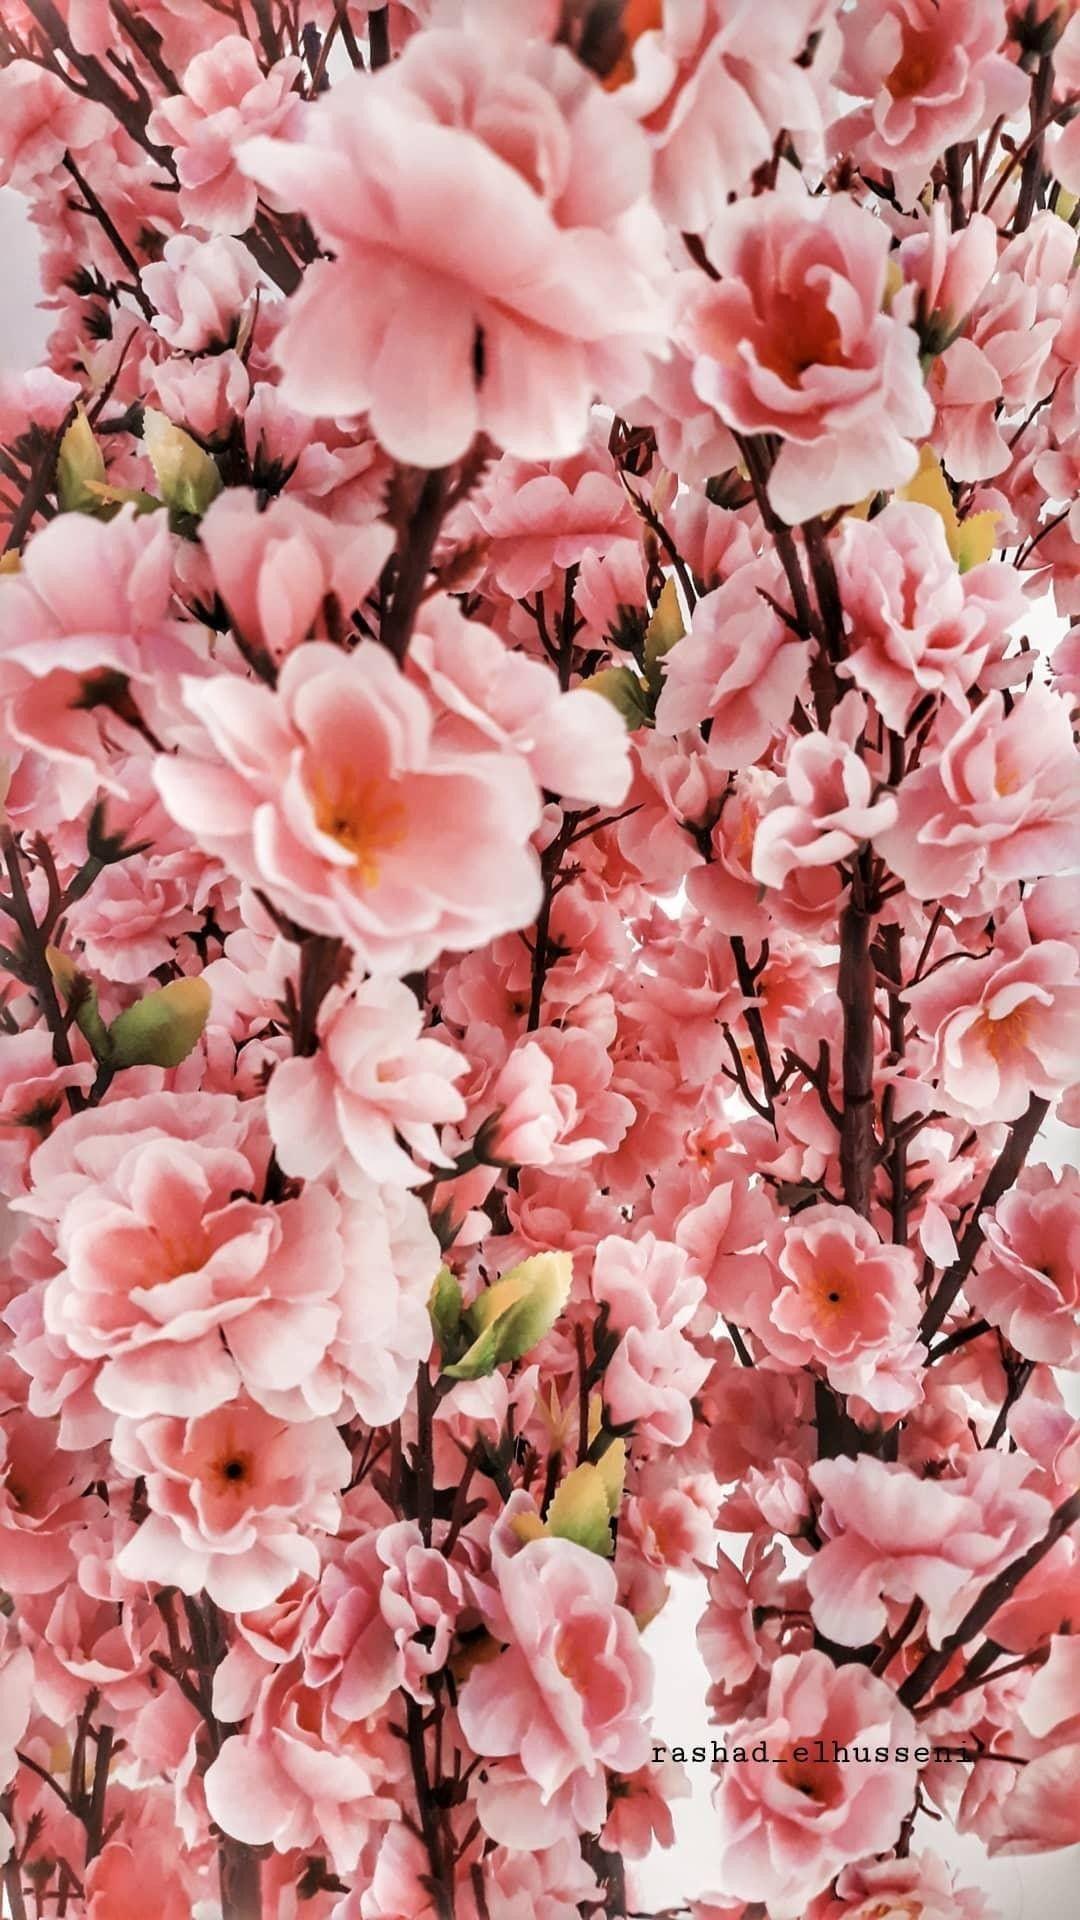 Flowers Flower Photography Instapic Petal Petals Nature Beautiful Love Pretty Plants Blo Instagram Photo Instagram Photo